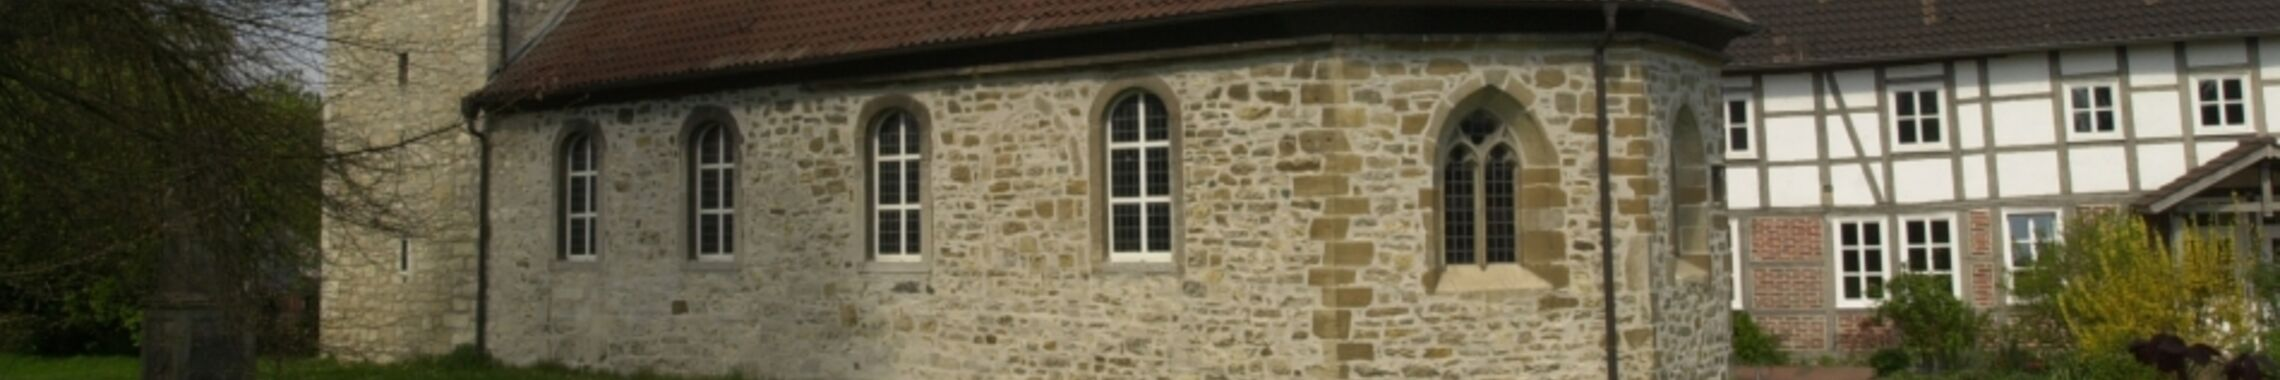 St. Petri Mörse